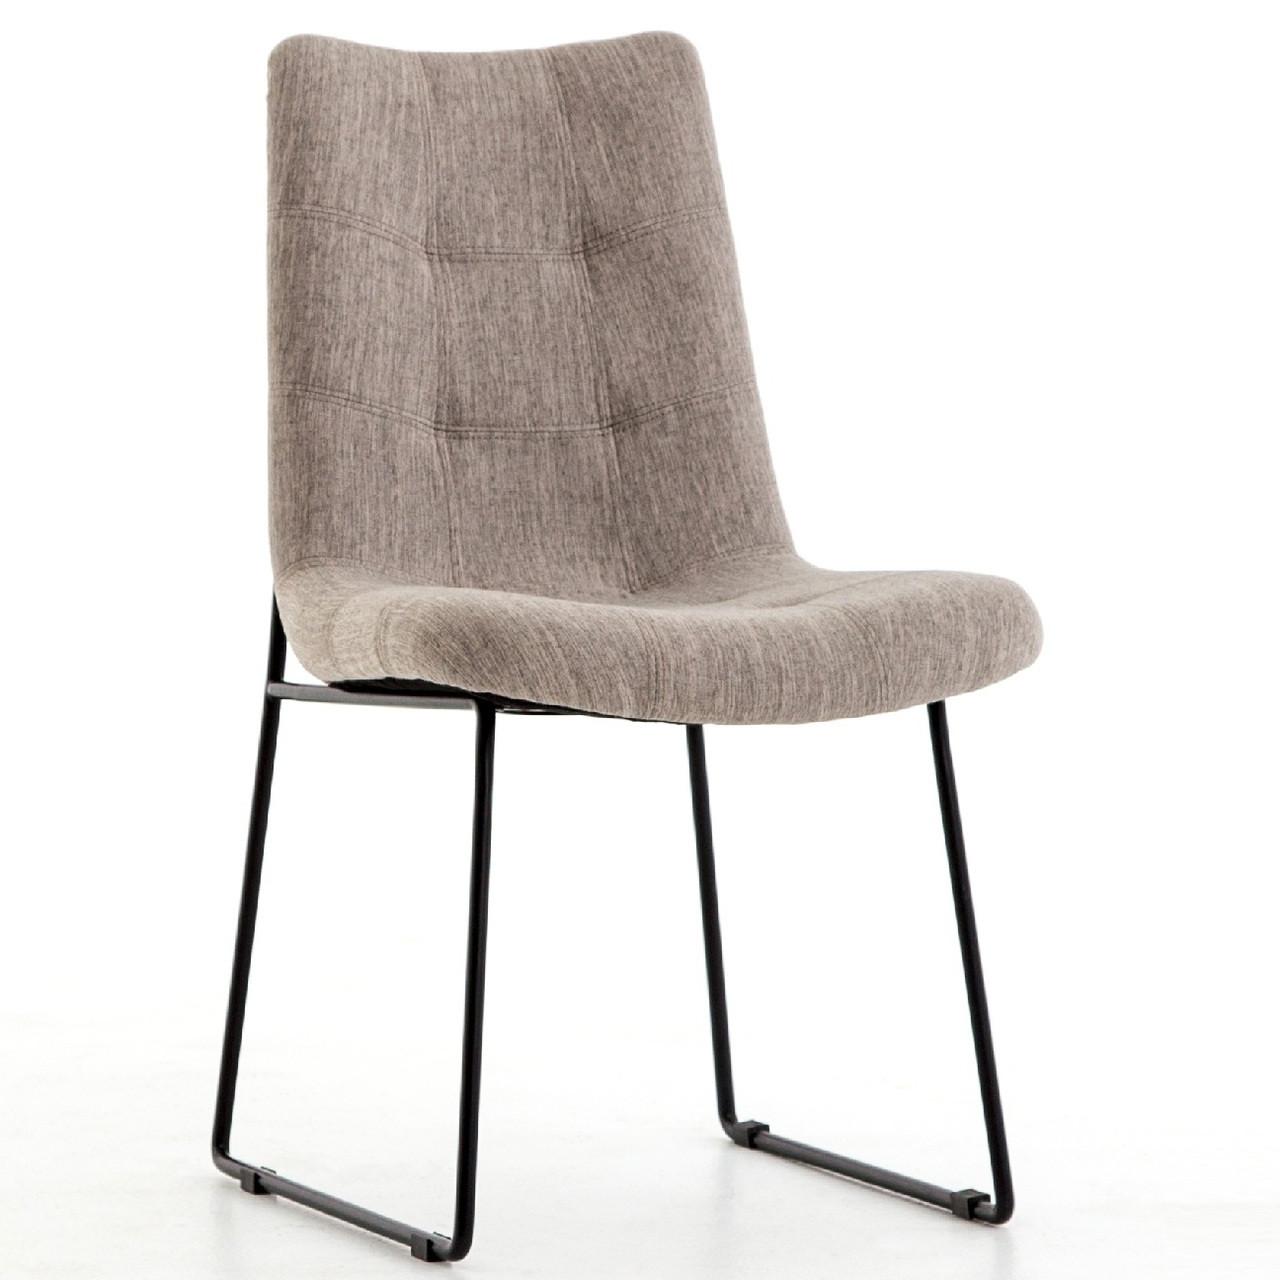 FlannelZin Leg Home Savile Black Dining Iron Chair Camile FcJ3uTlK1